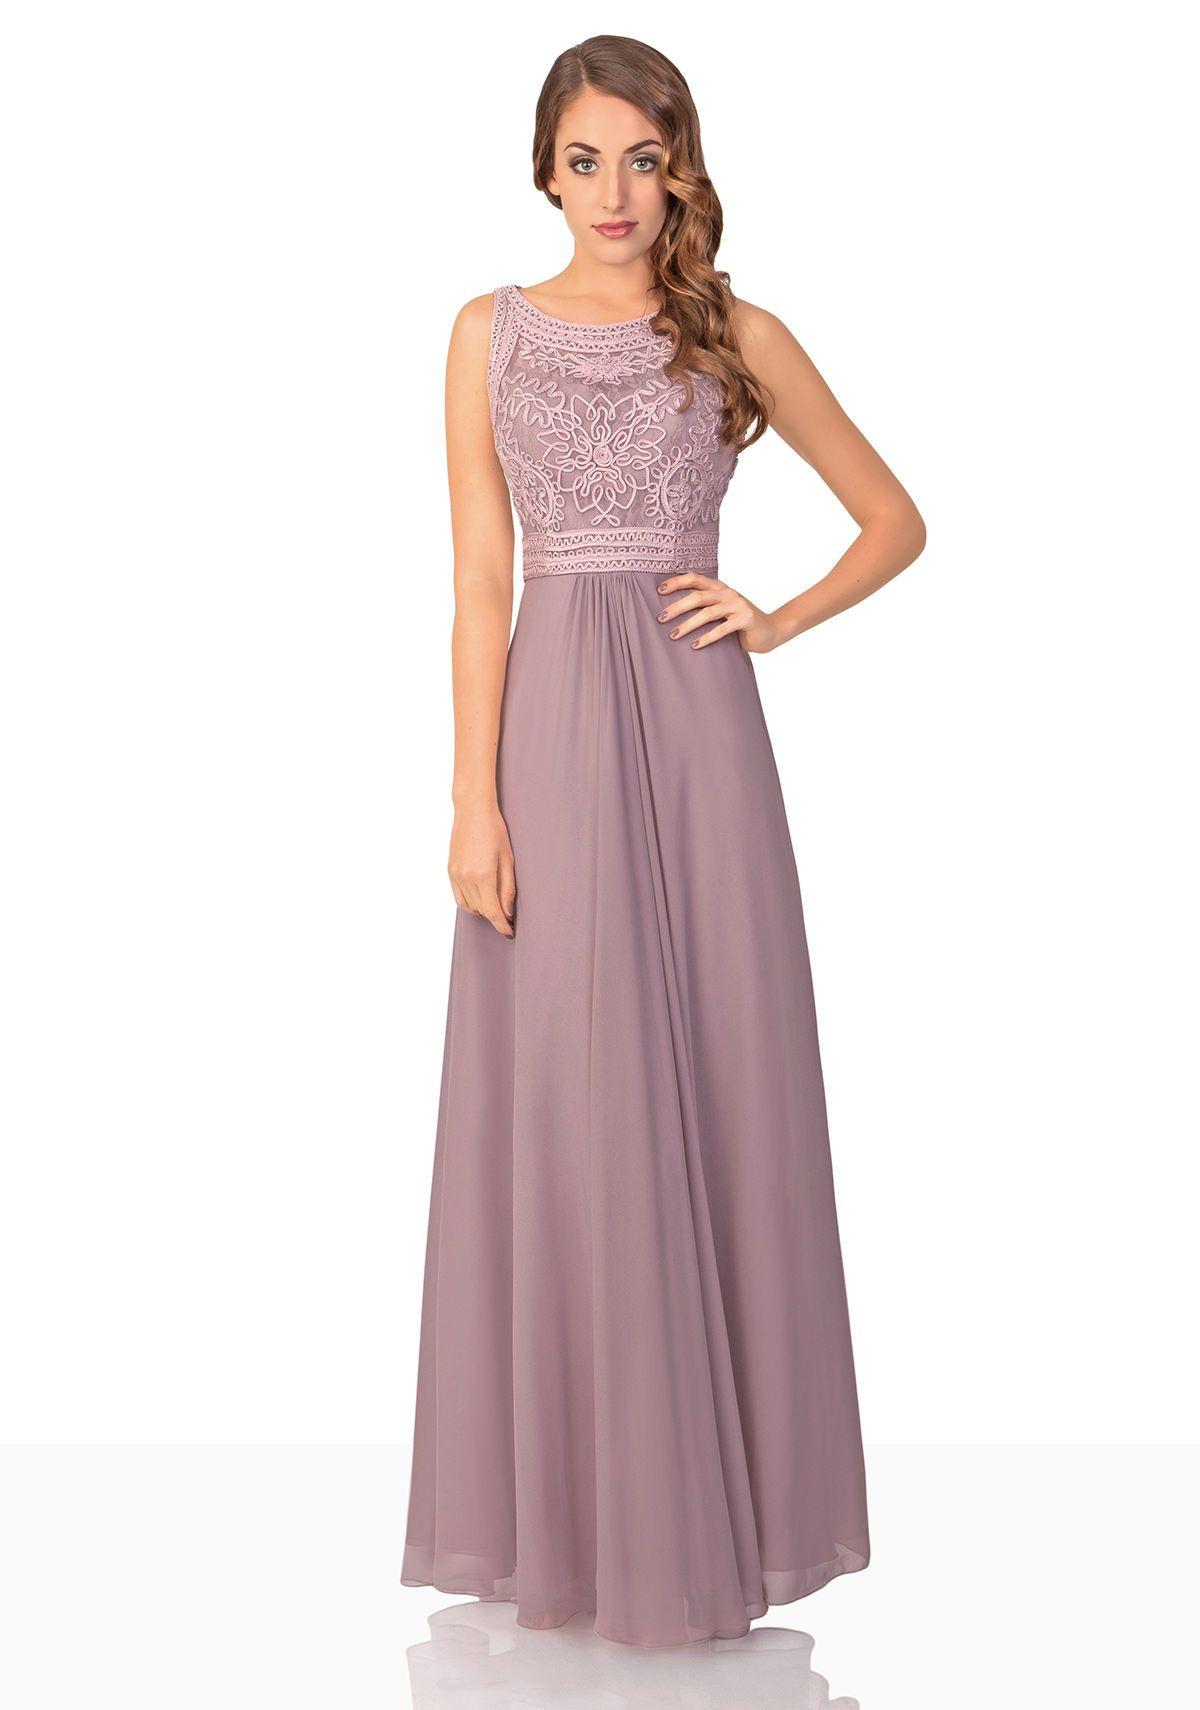 17 Elegant Abendkleid Altrosa Lang Vertrieb Elegant Abendkleid Altrosa Lang Spezialgebiet